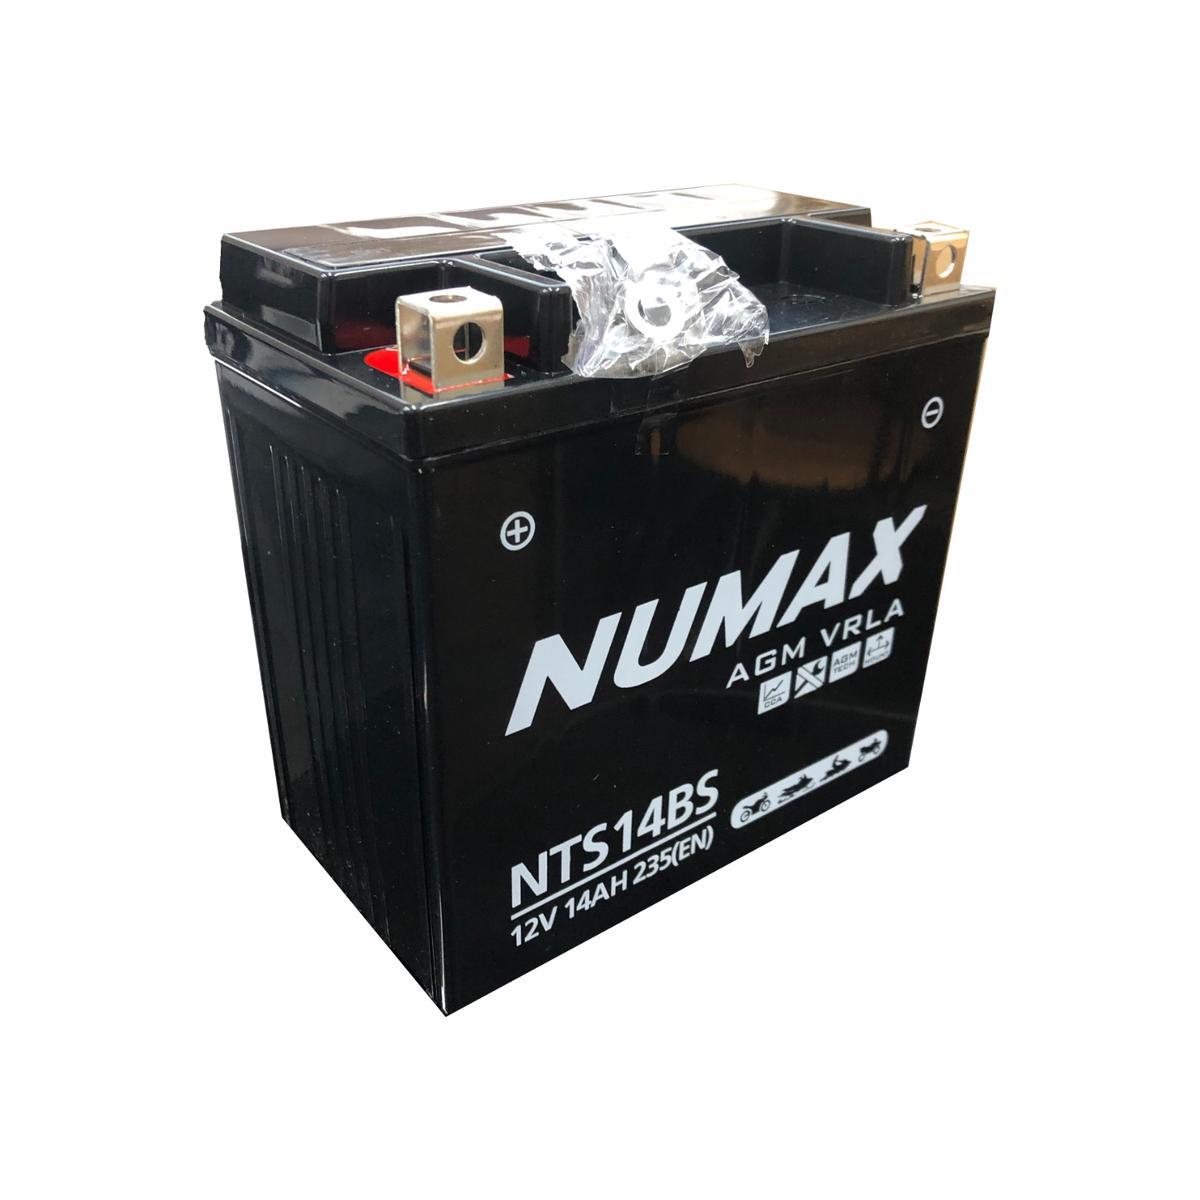 Numax NTS14BS 12v Motorbike Battery CAGIVA 1000cc Gran Canyon YTX14-4